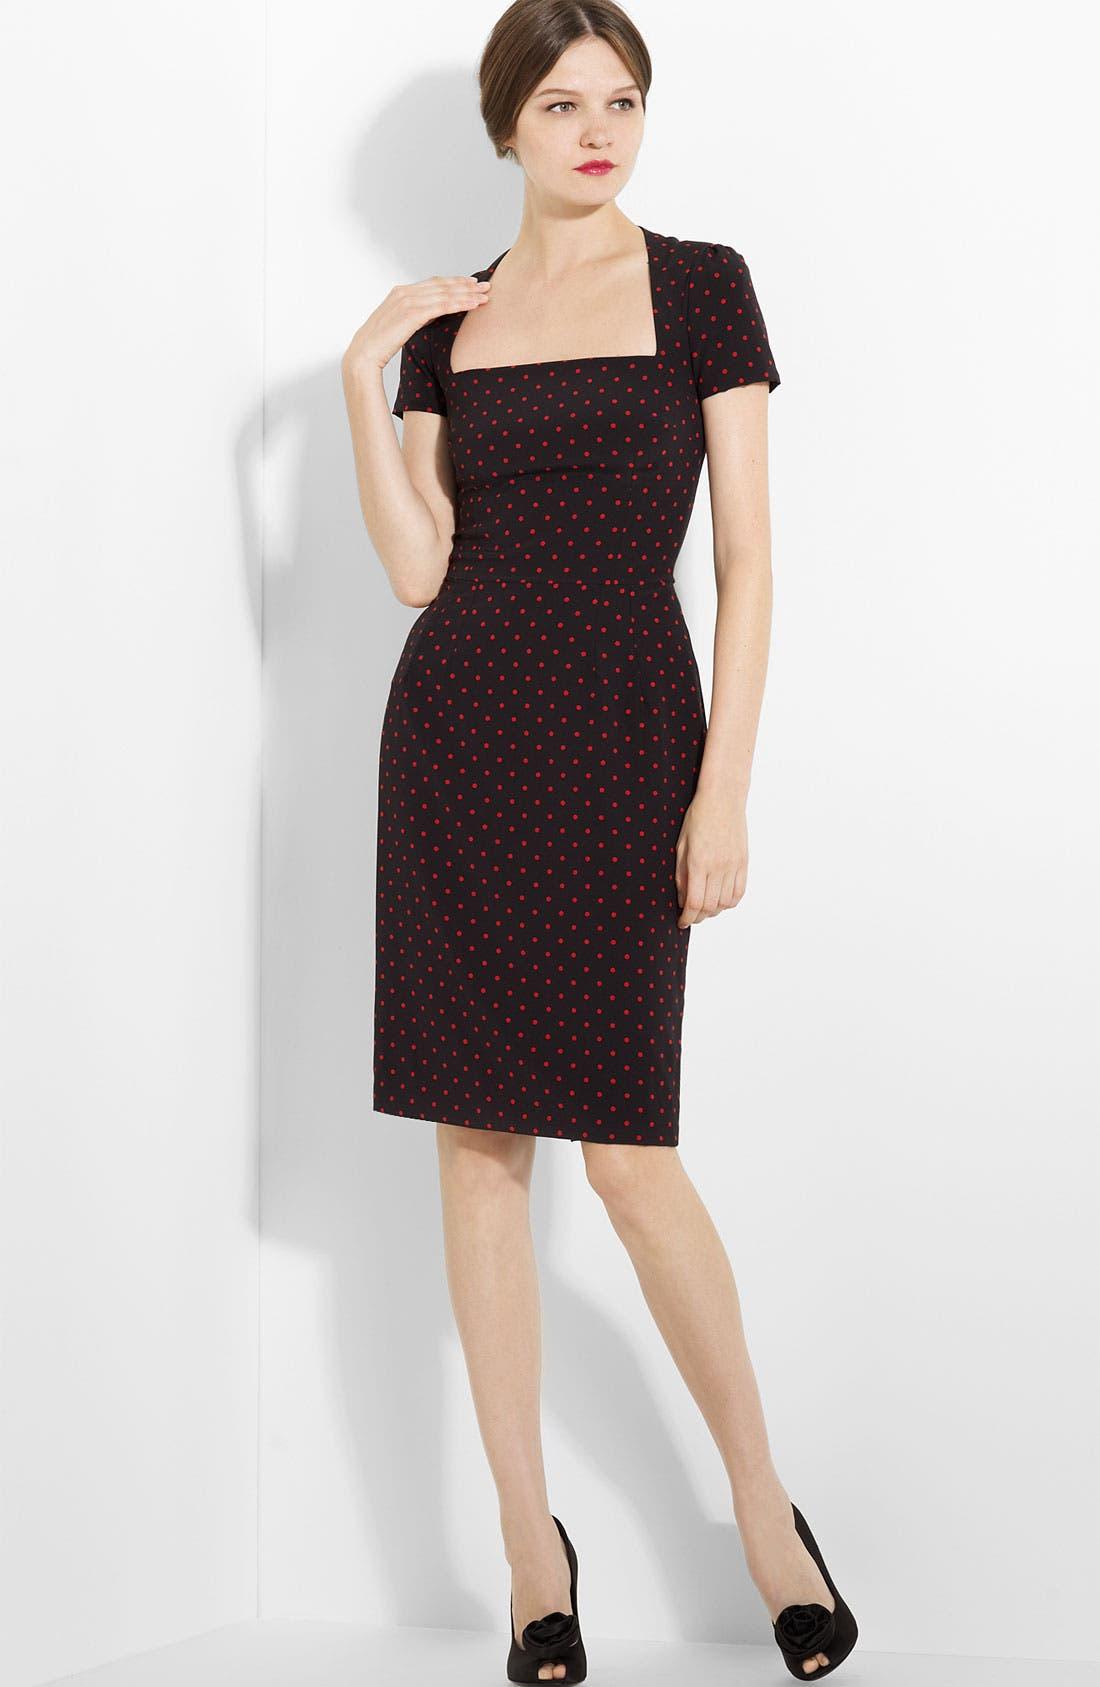 Alternate Image 1 Selected - Dolce&Gabbana Polka Dot Stretch Charmeuse Dress